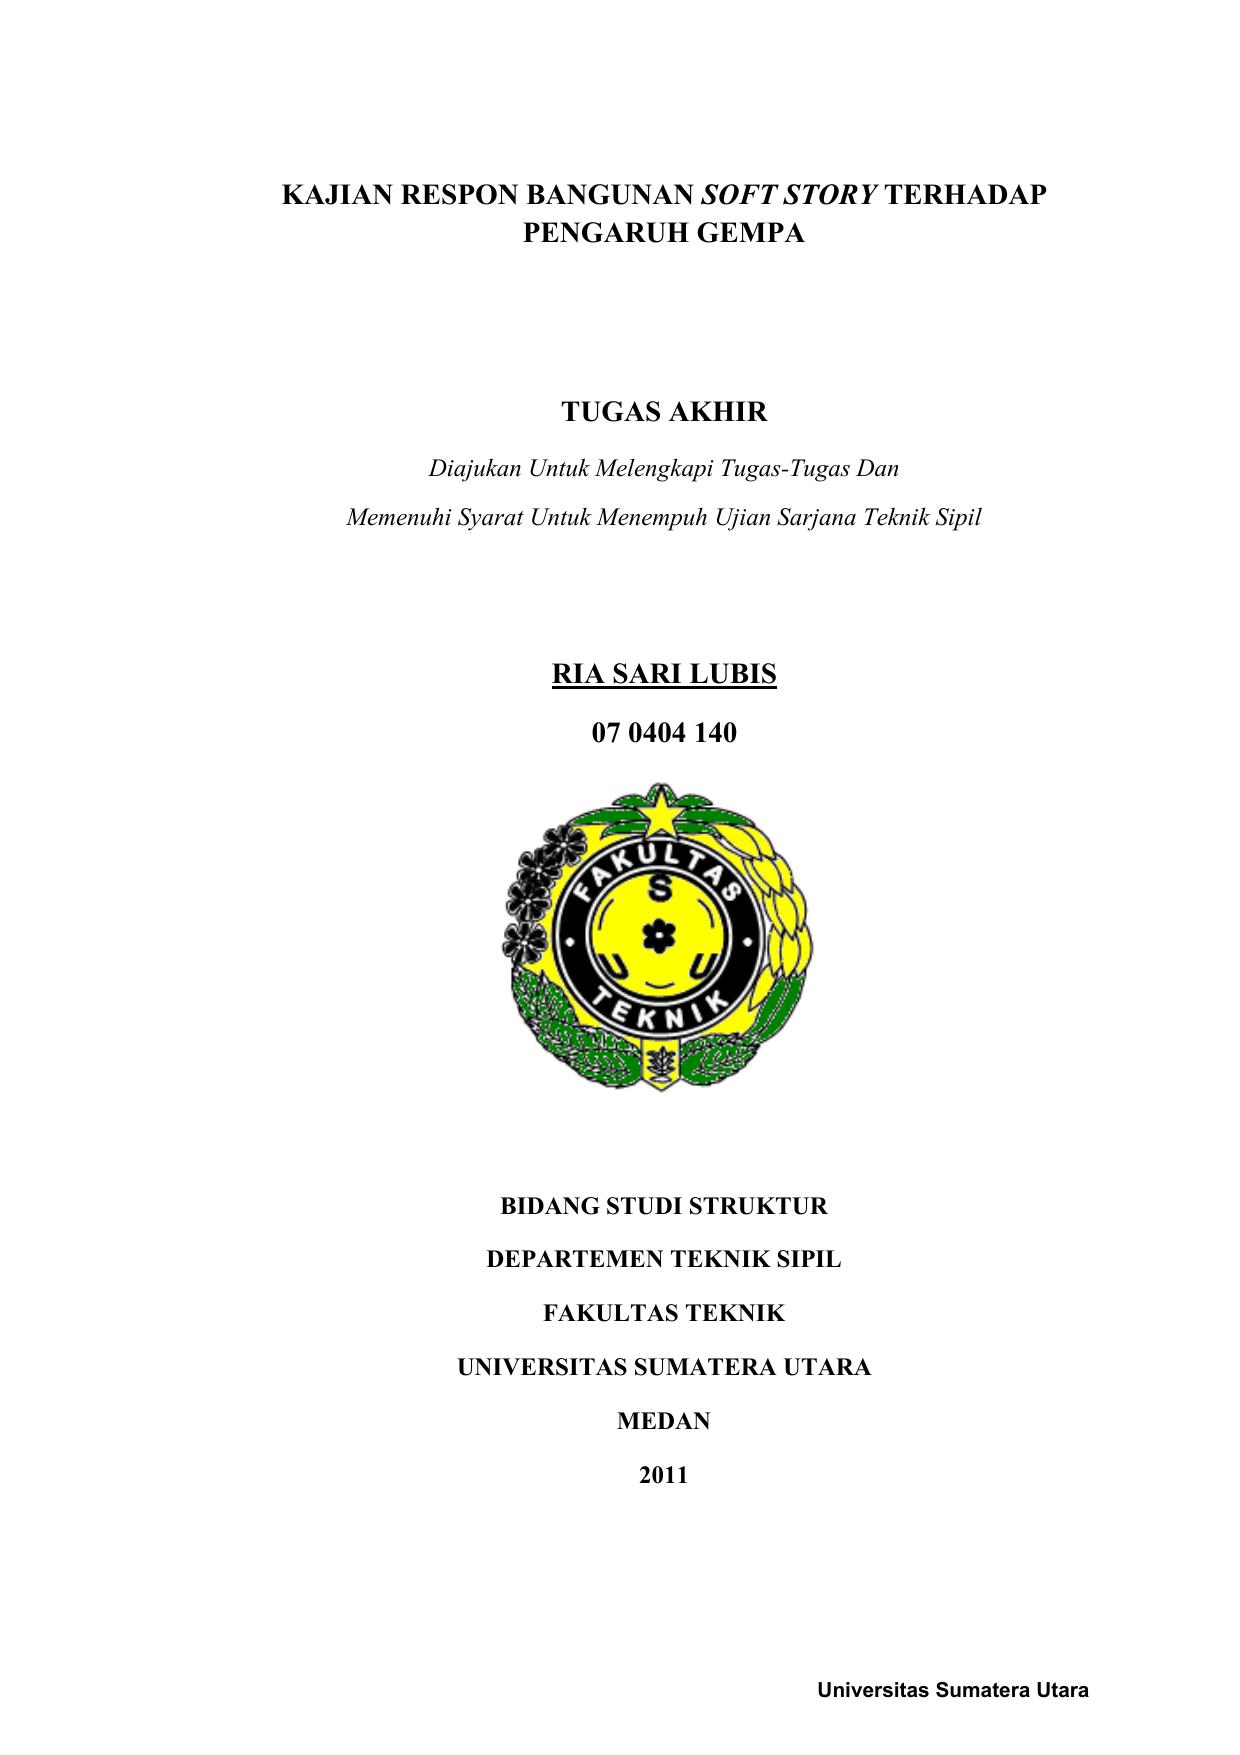 Tugas Akhir Usu Ir Universitas Sumatera Utara